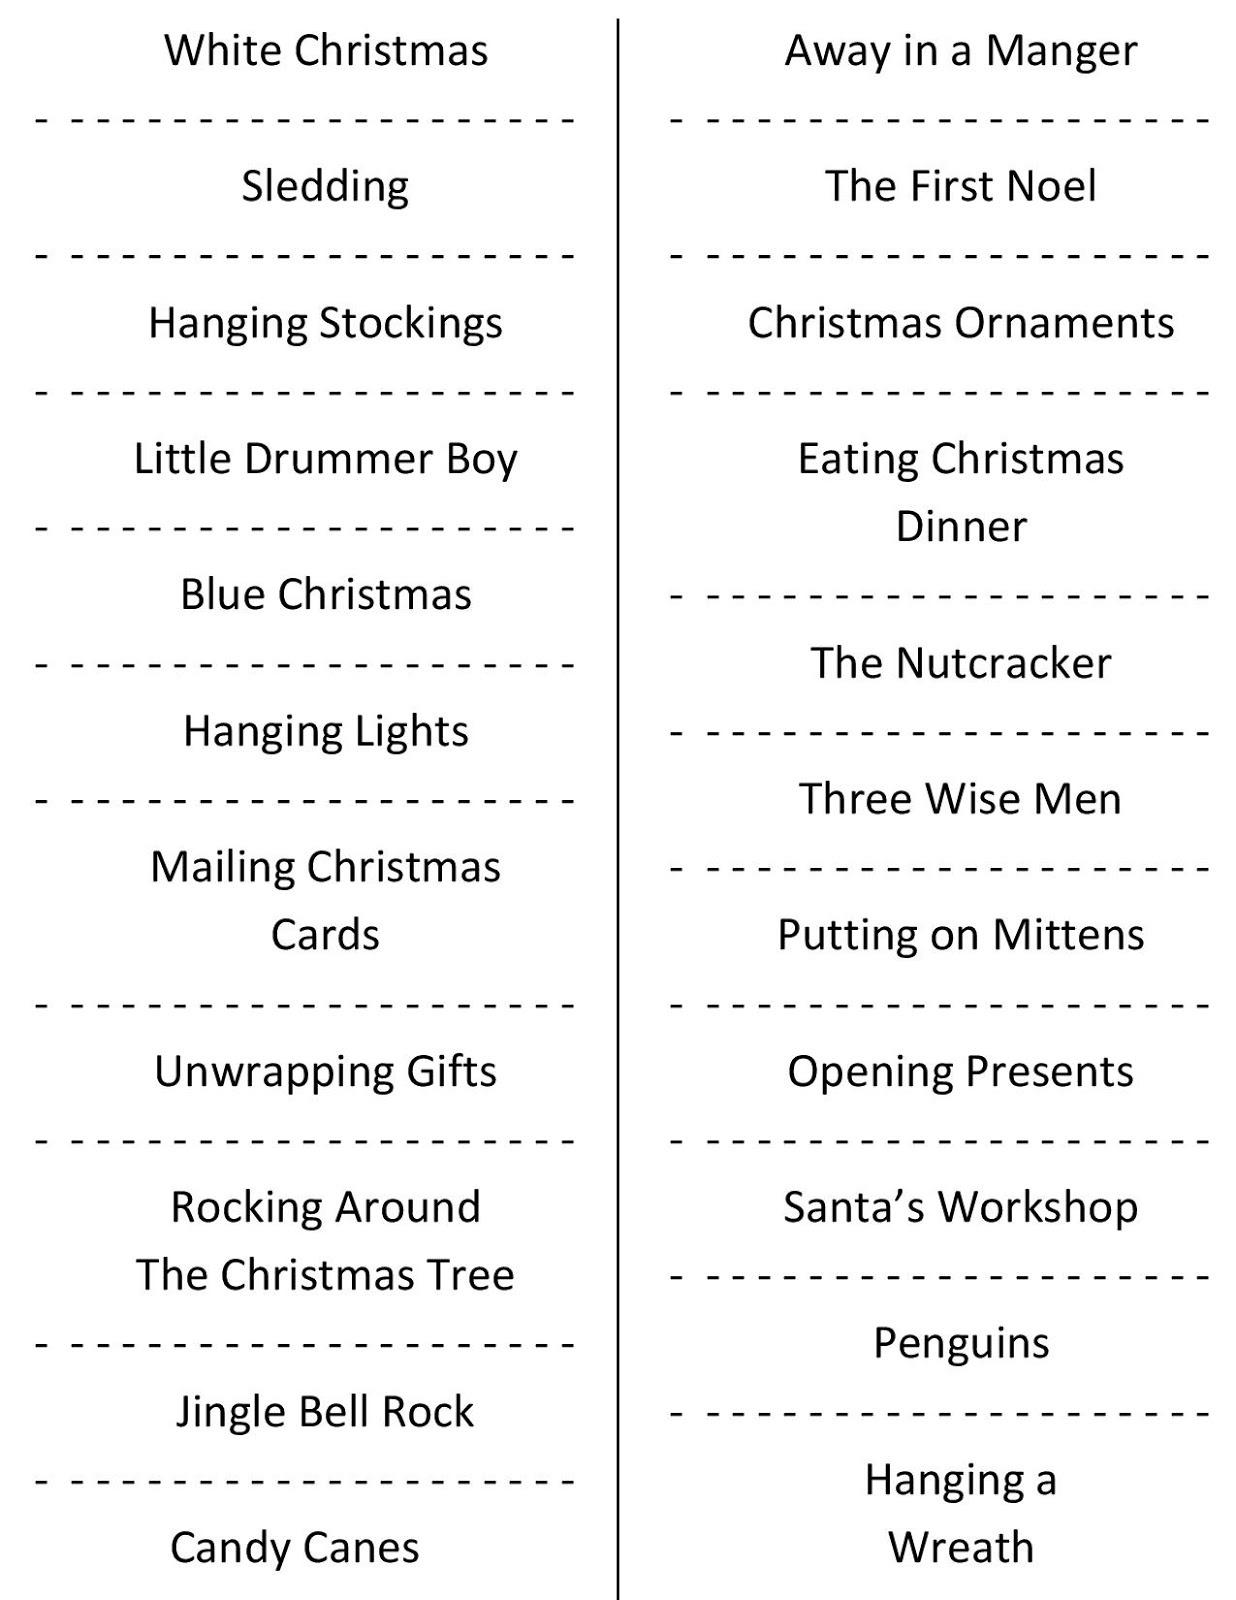 Christmas Charades (Free Printable Party Game) - Free Printable Christmas Charades Cards